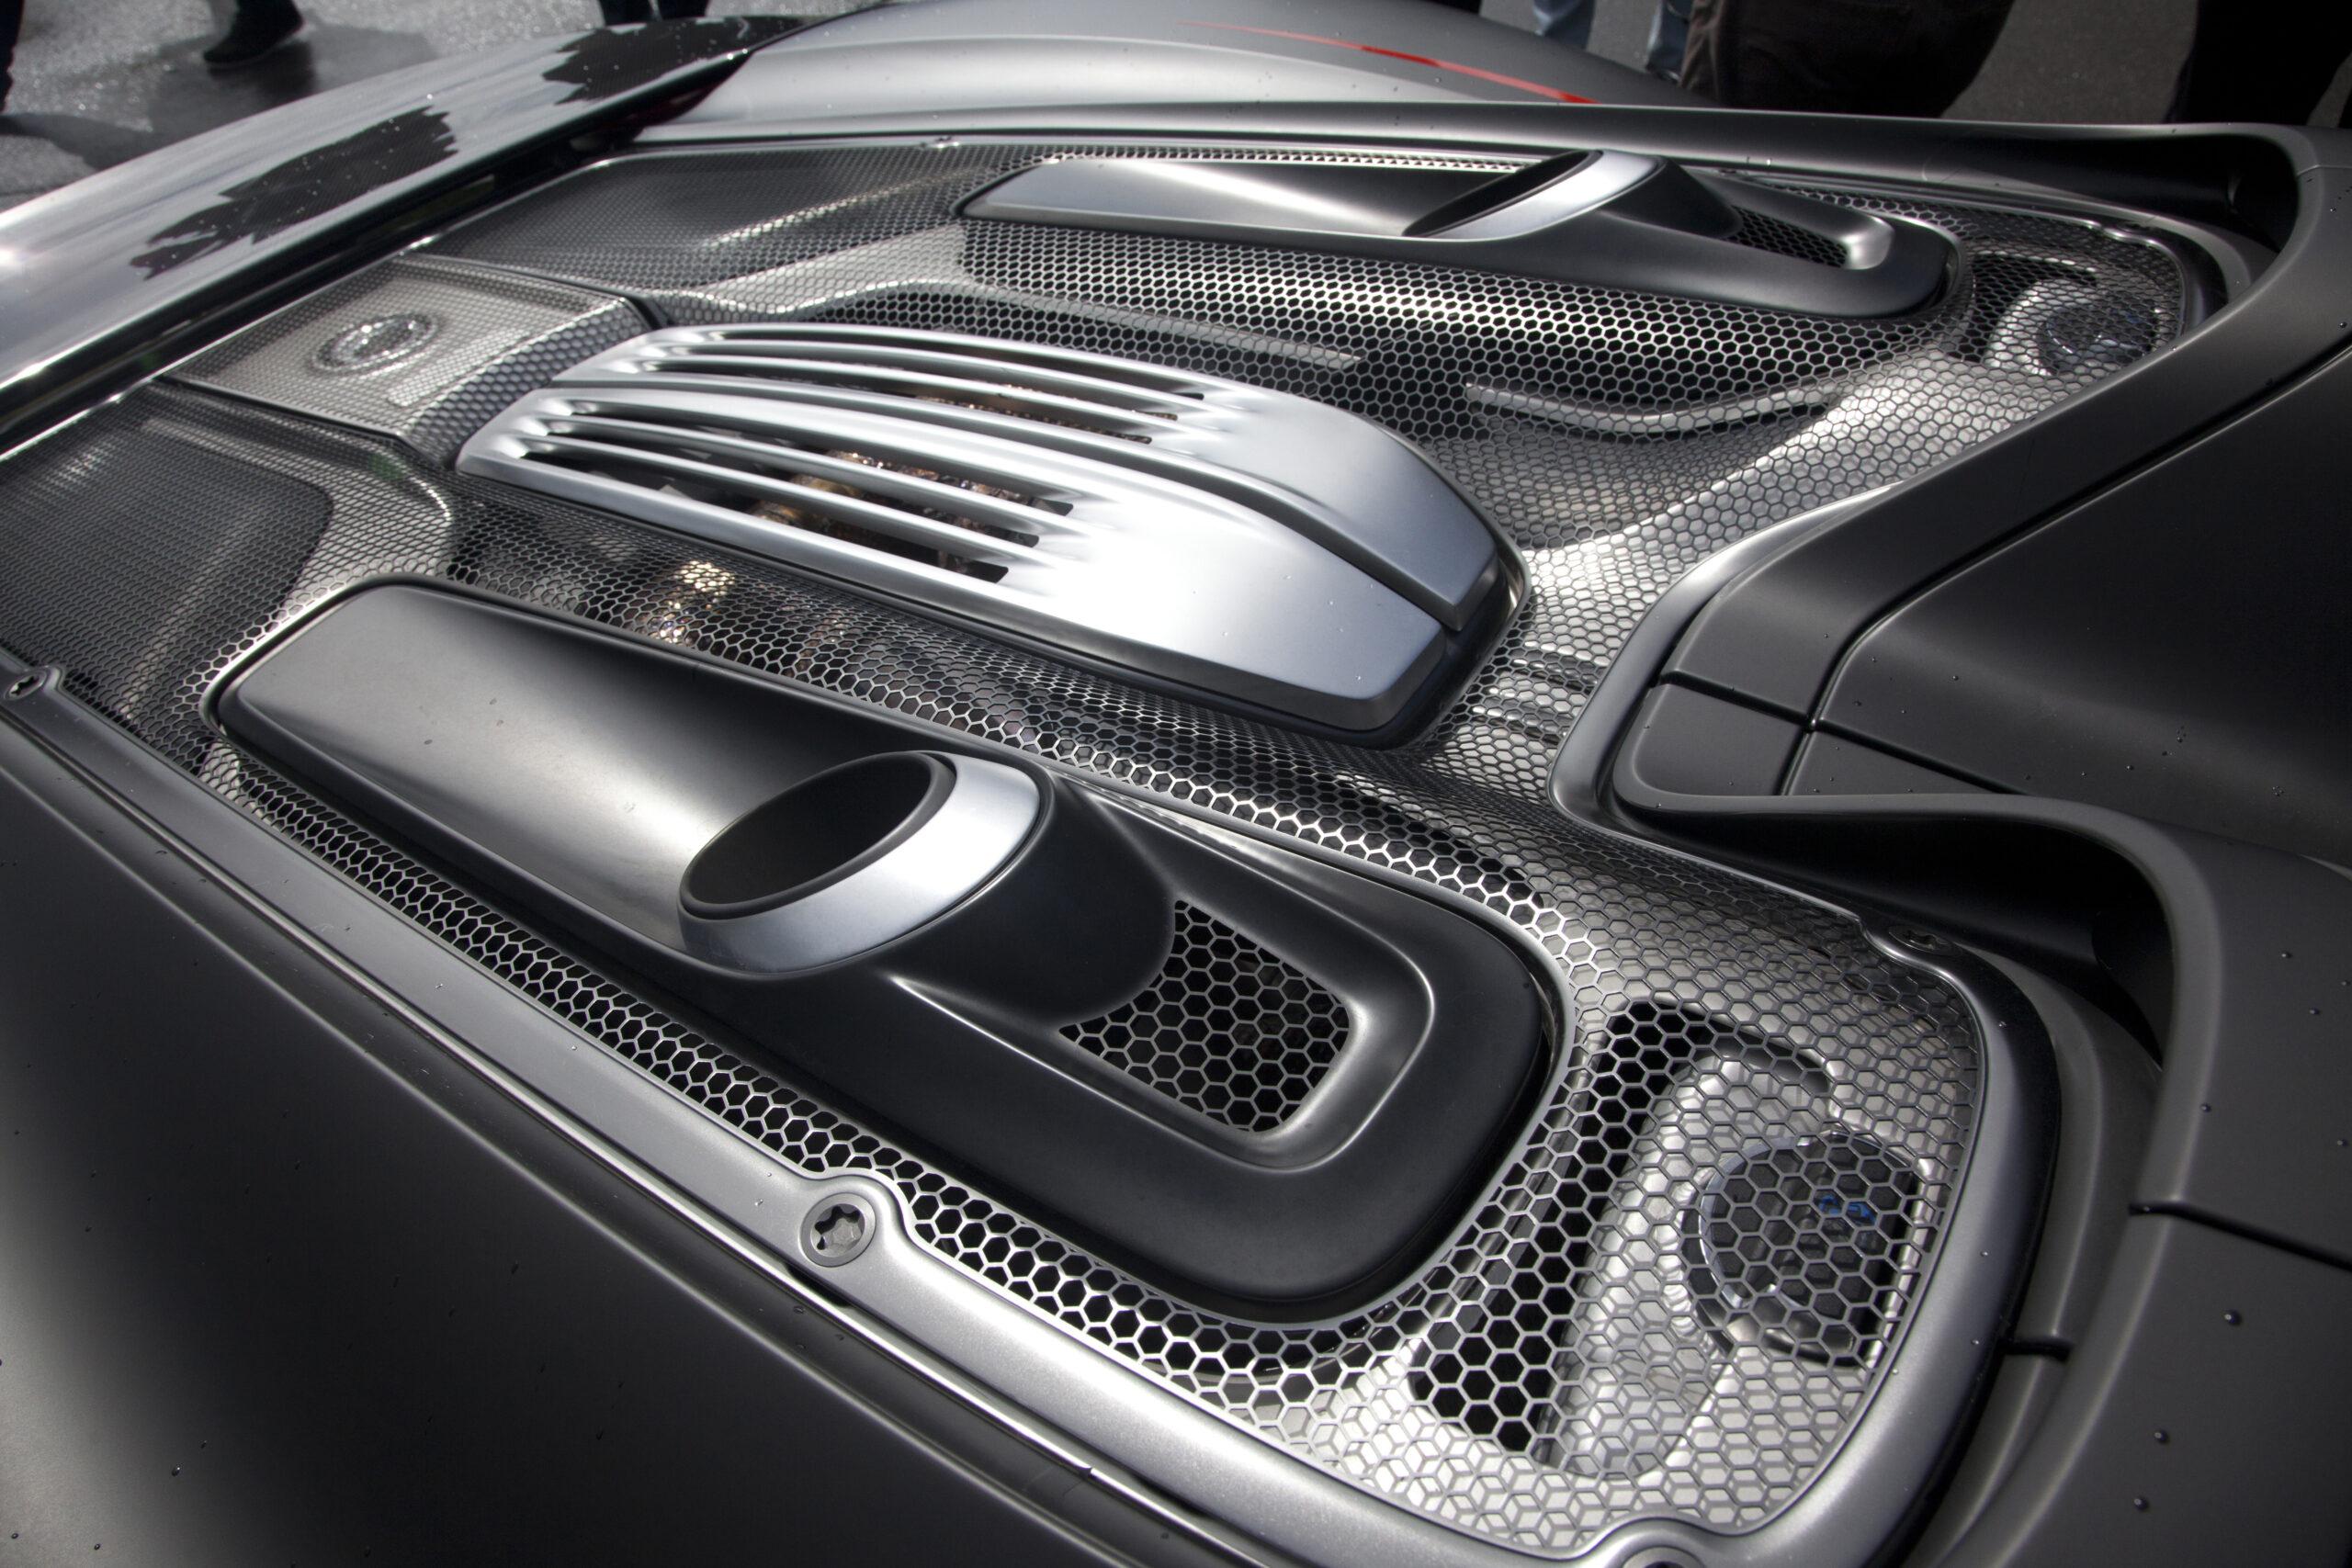 Porsche 918 Spyder engine and engine cover